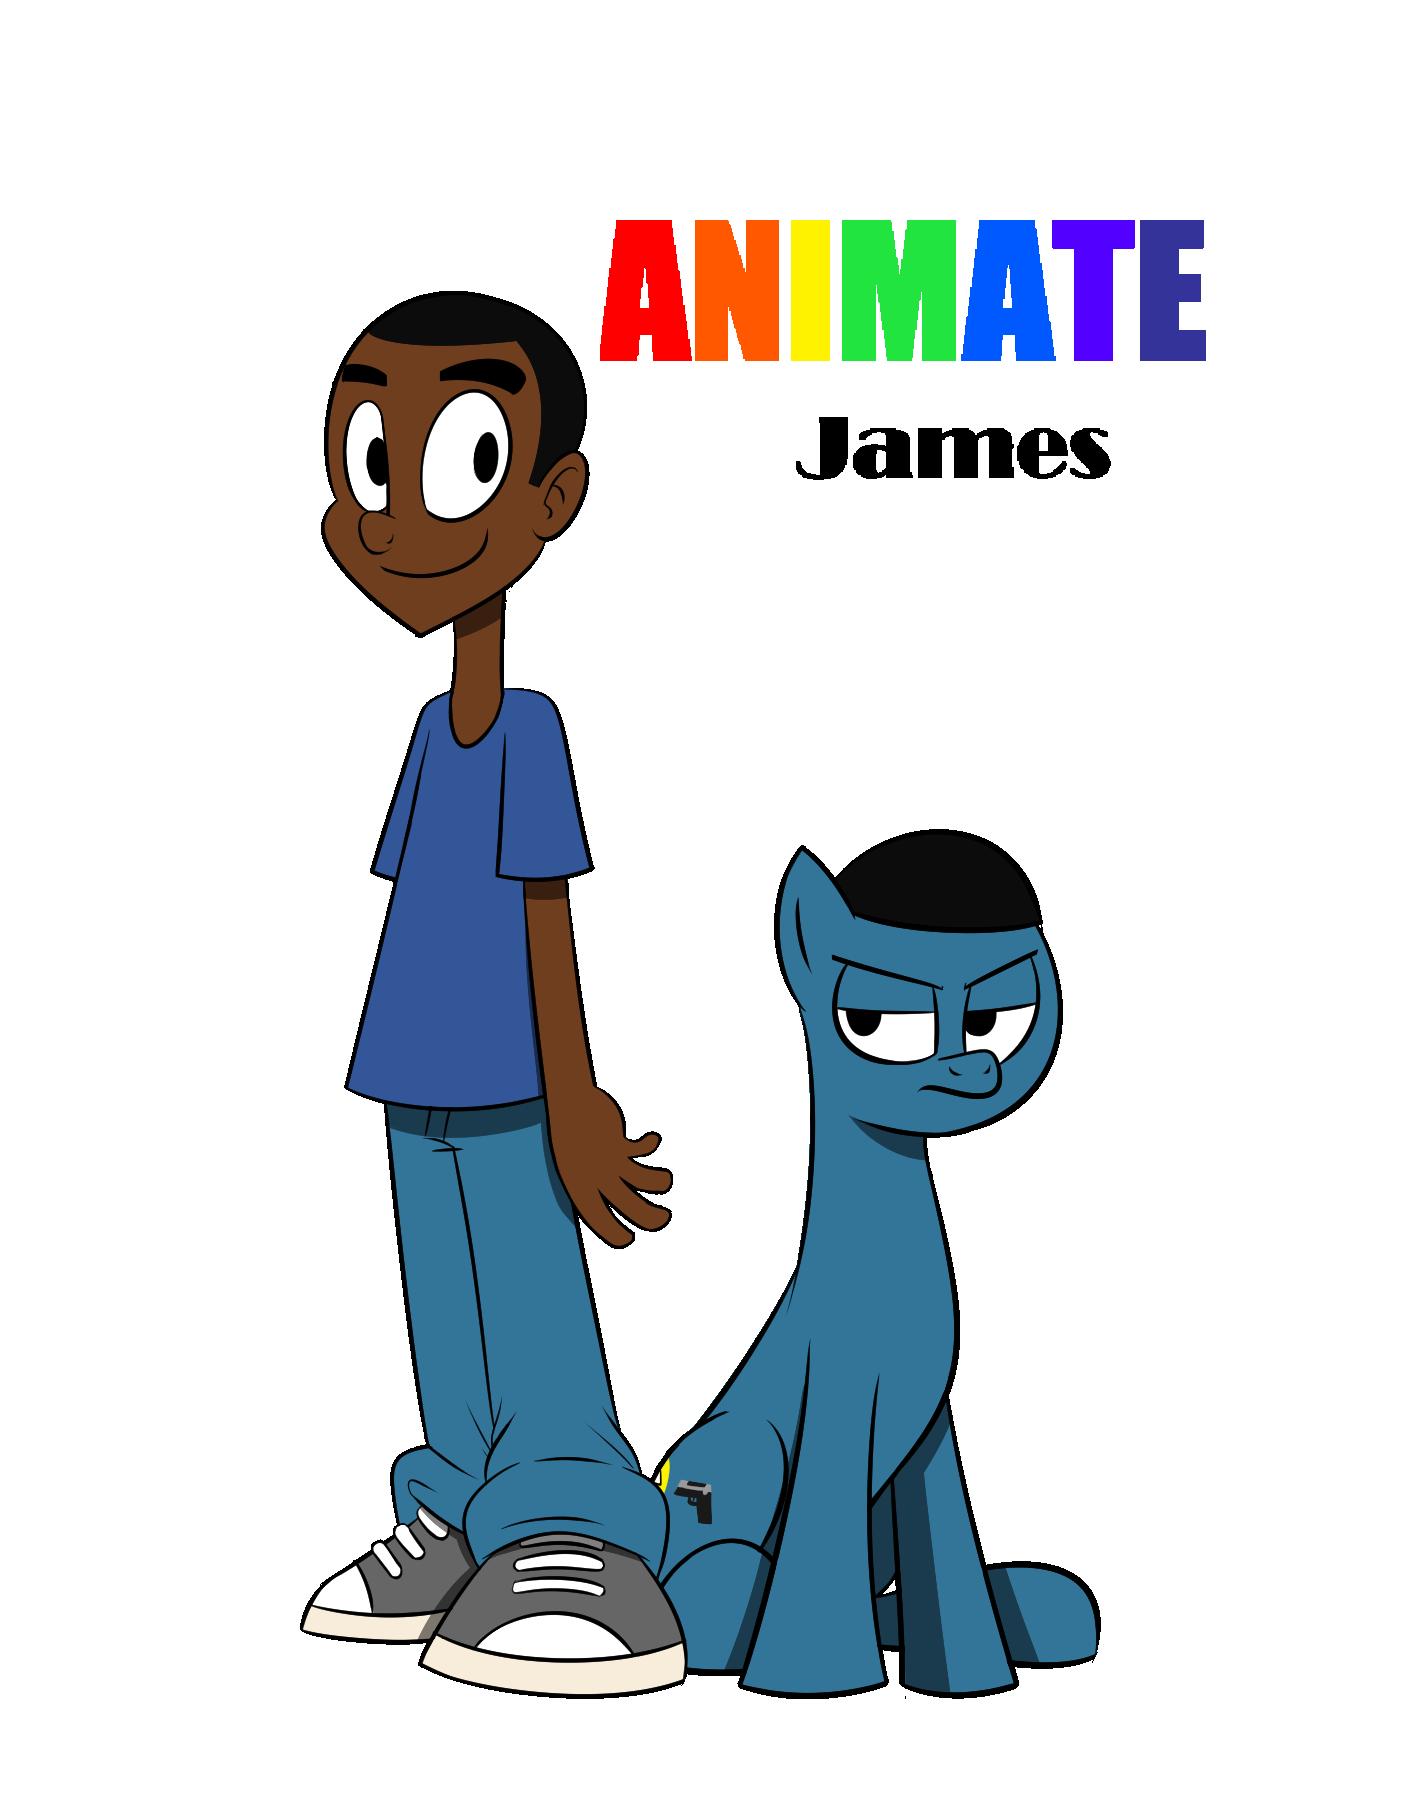 AnimatedJames Fan Art